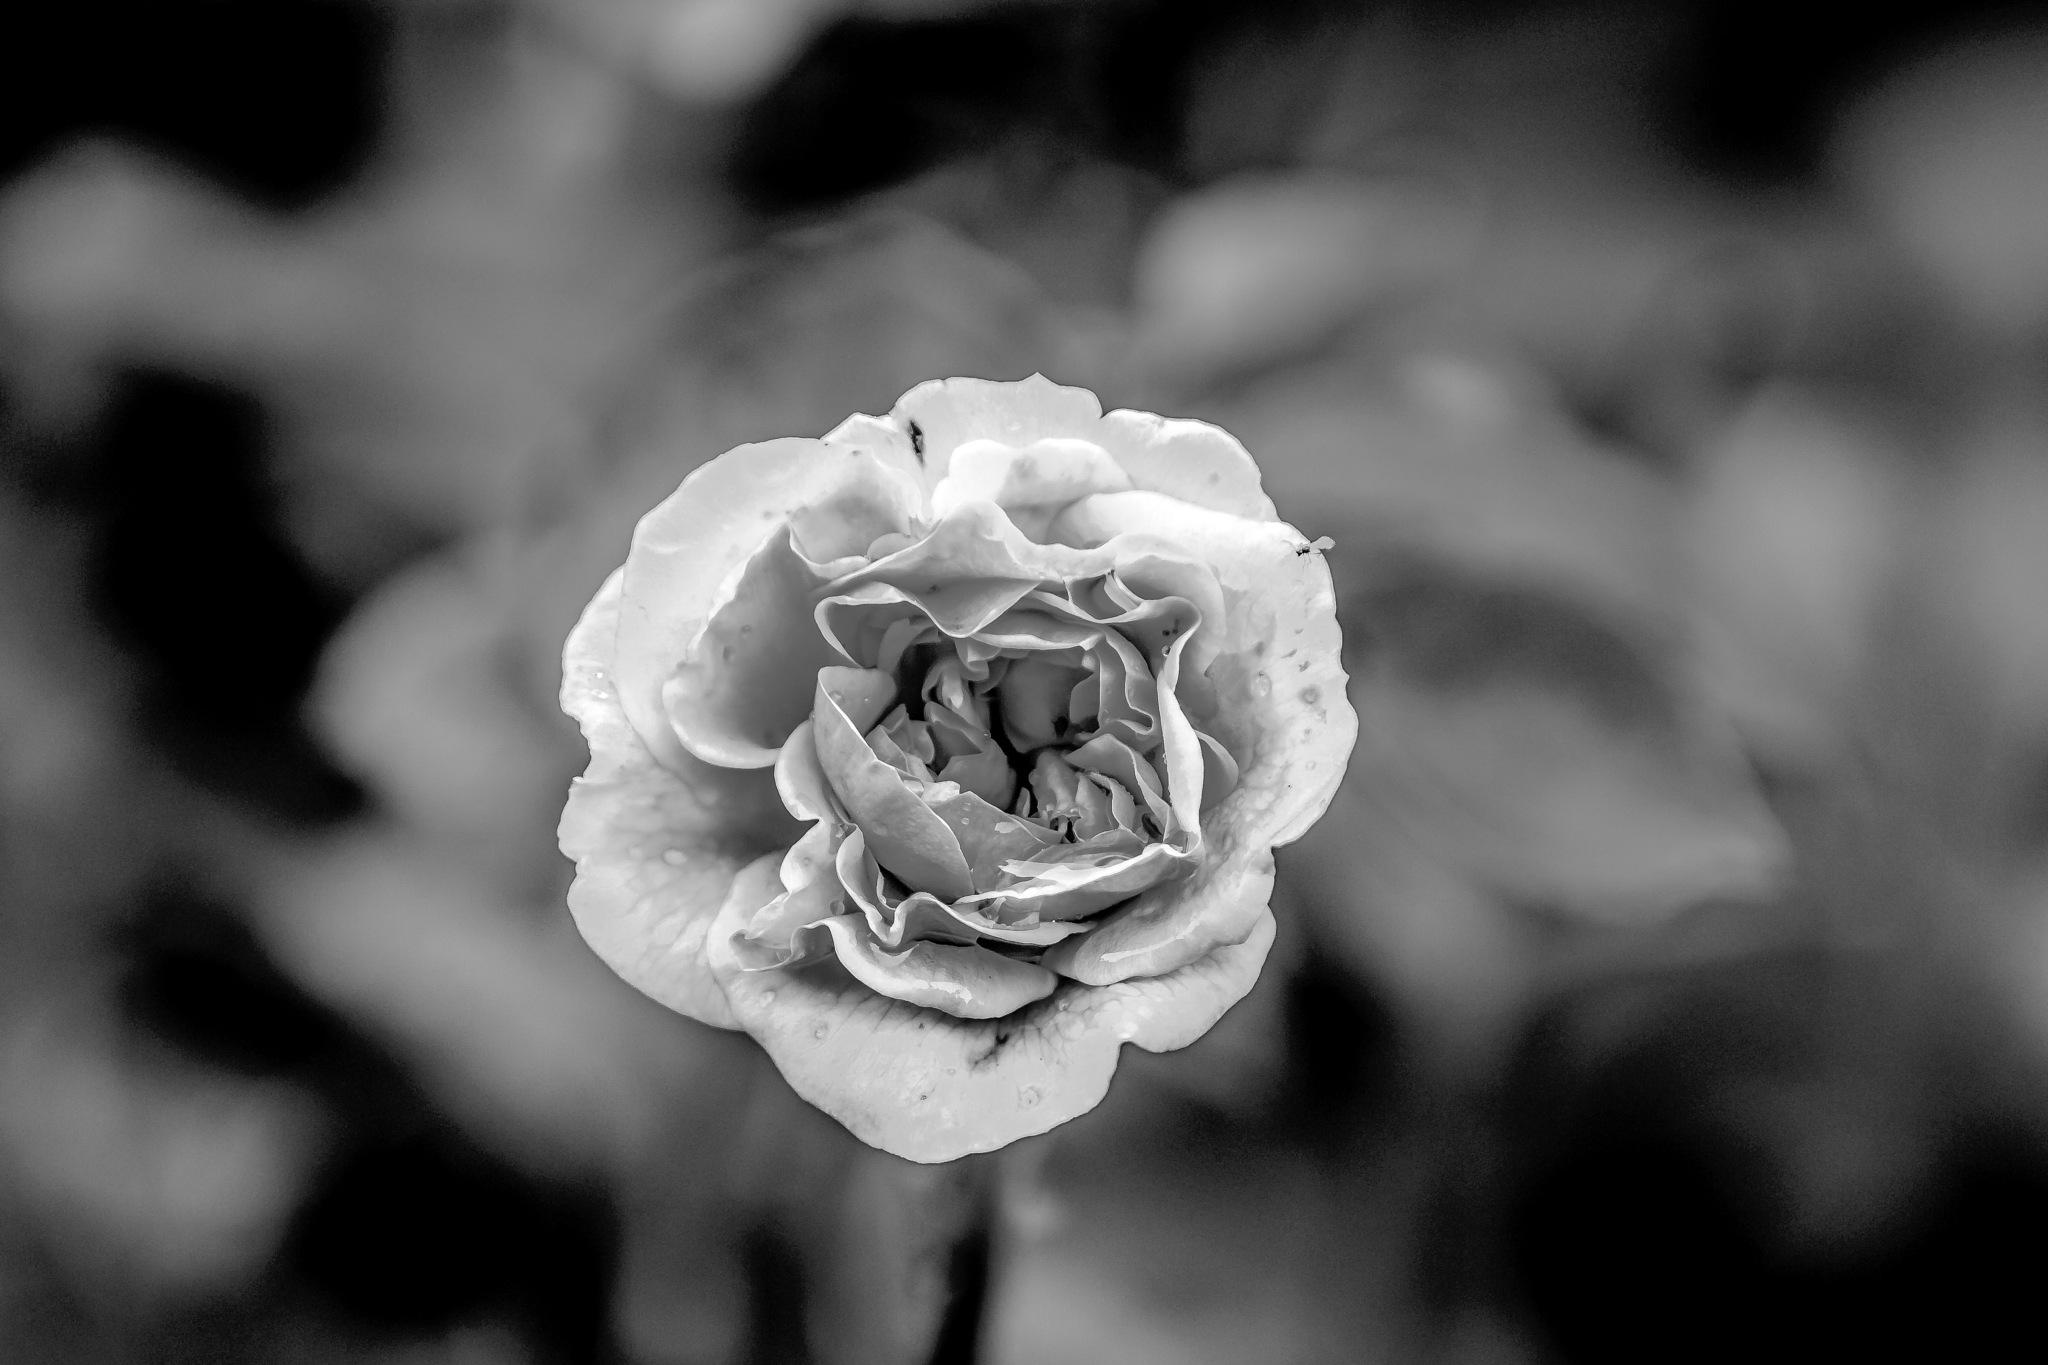 Rose 2 by Martyn